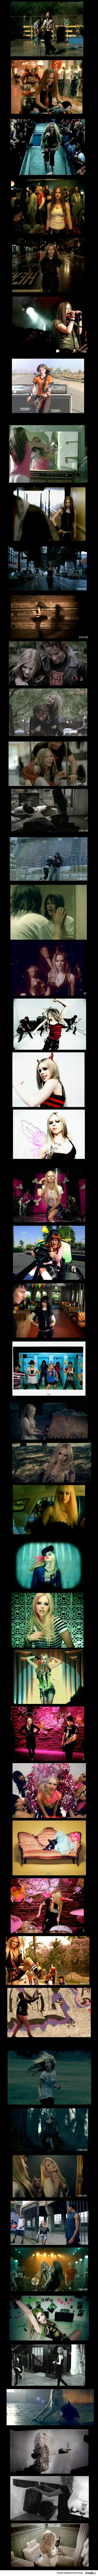 Avril Lavigne teledyski